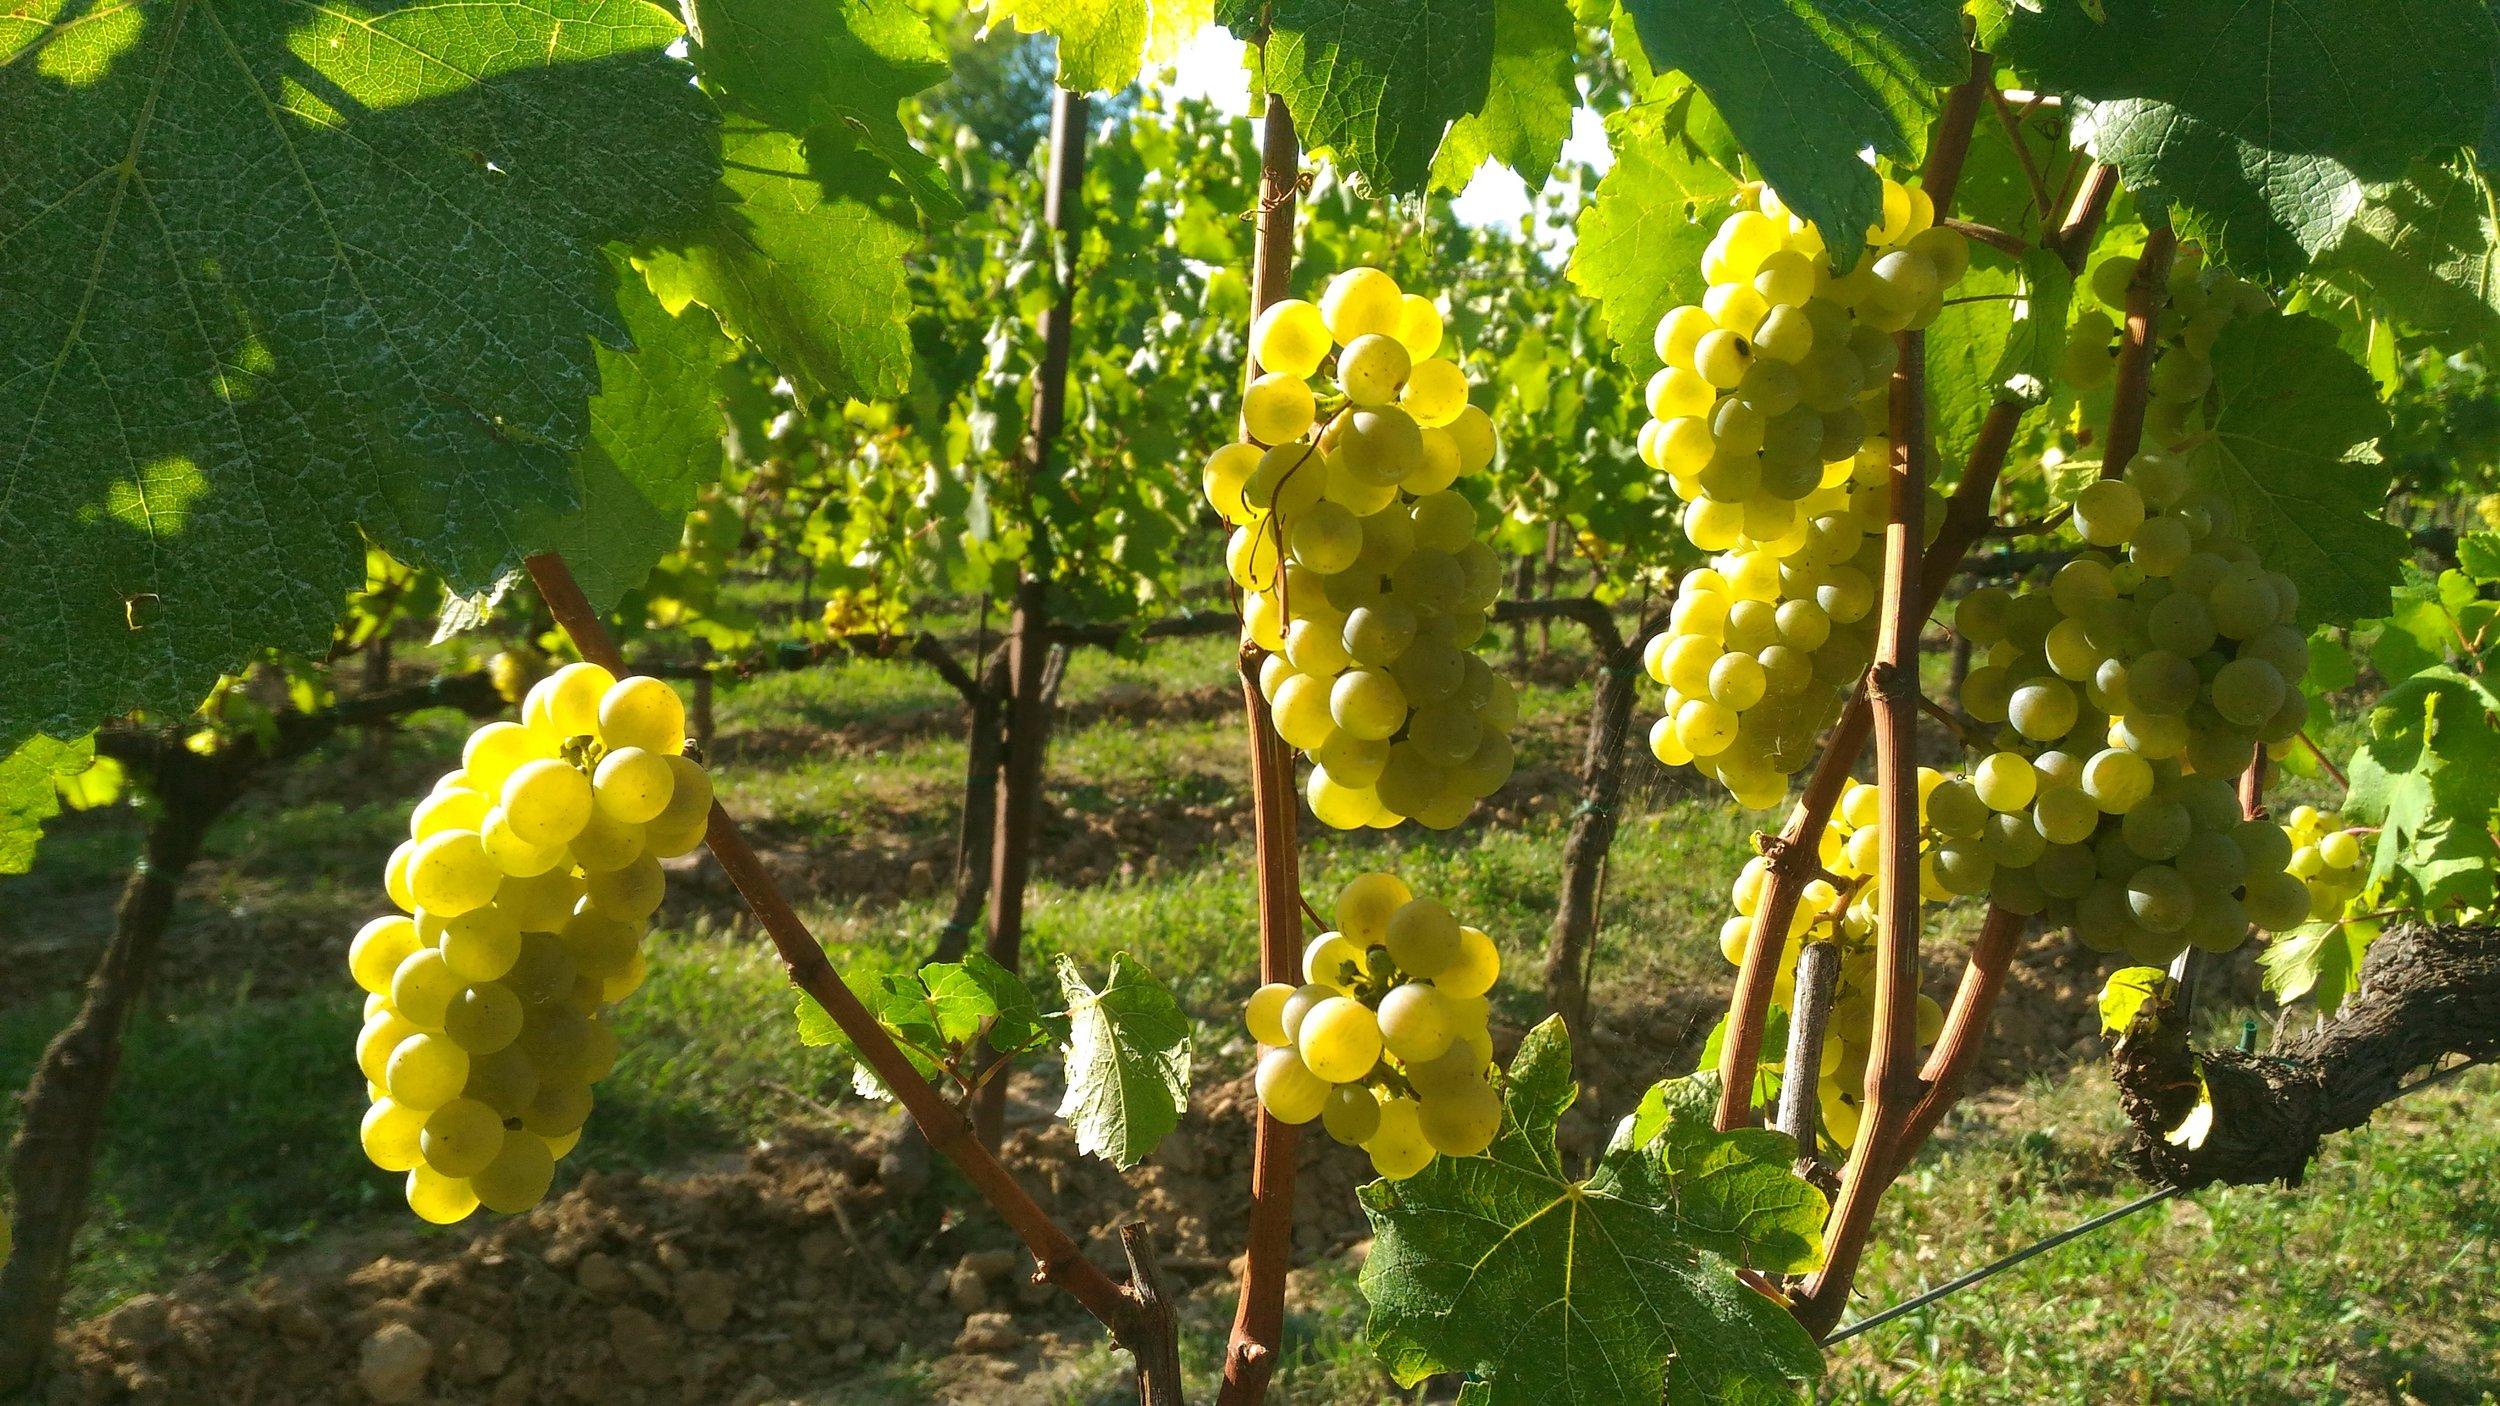 grapes-2642246.jpg